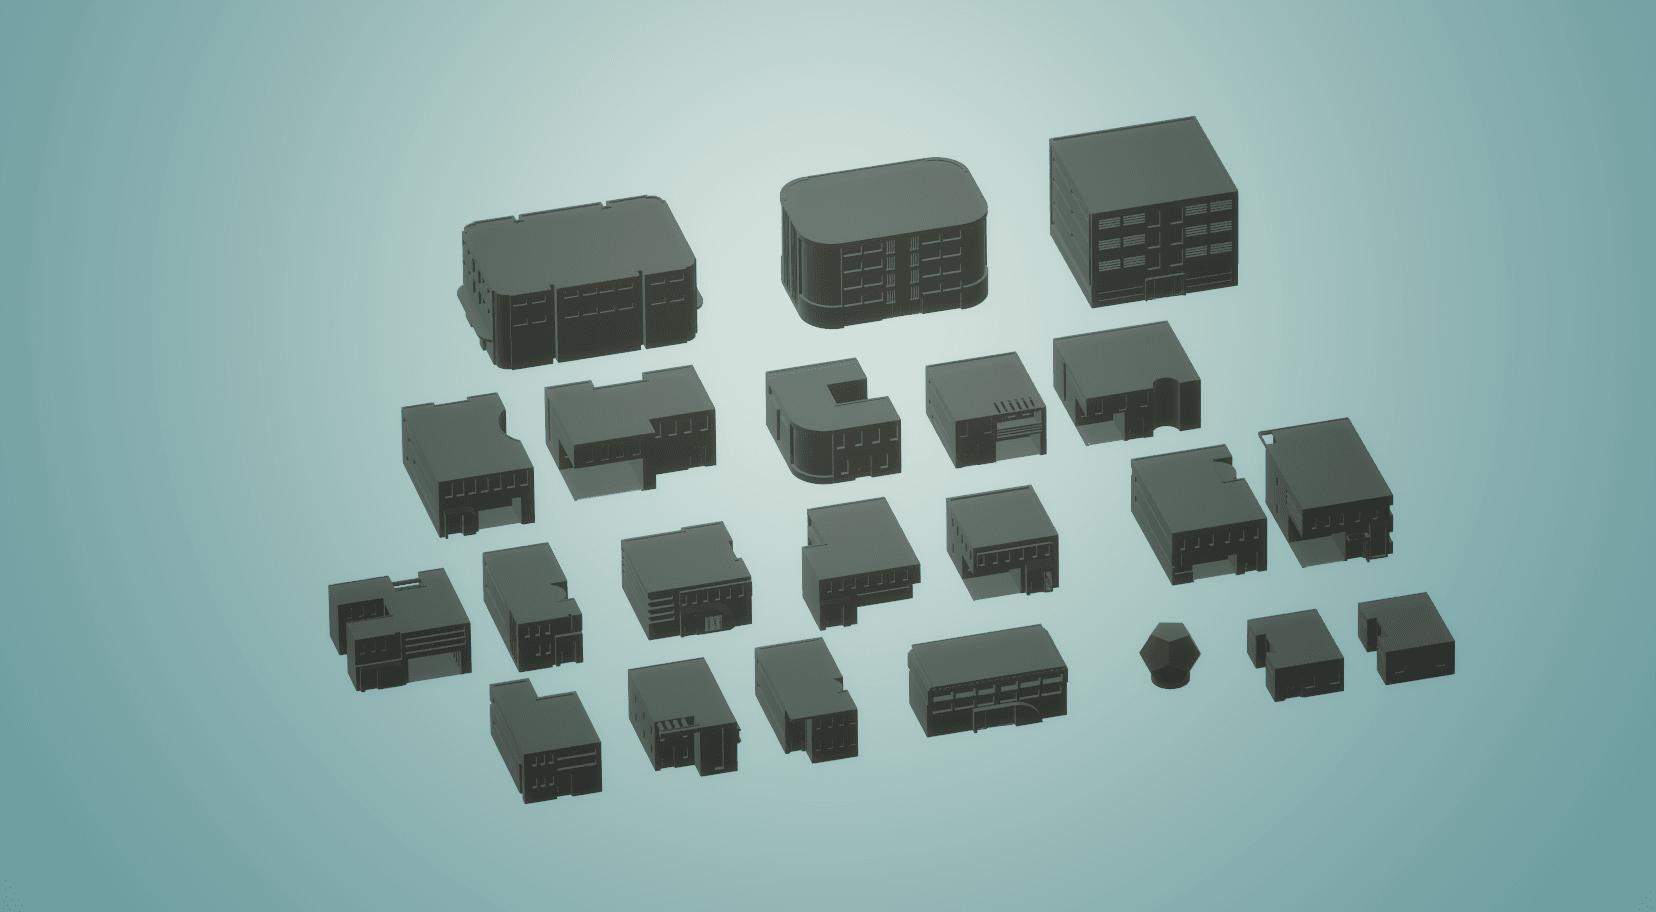 scifi.png Download STL file Battletech 3D Printable Scifi City • 3D printable model, gametree3dprint